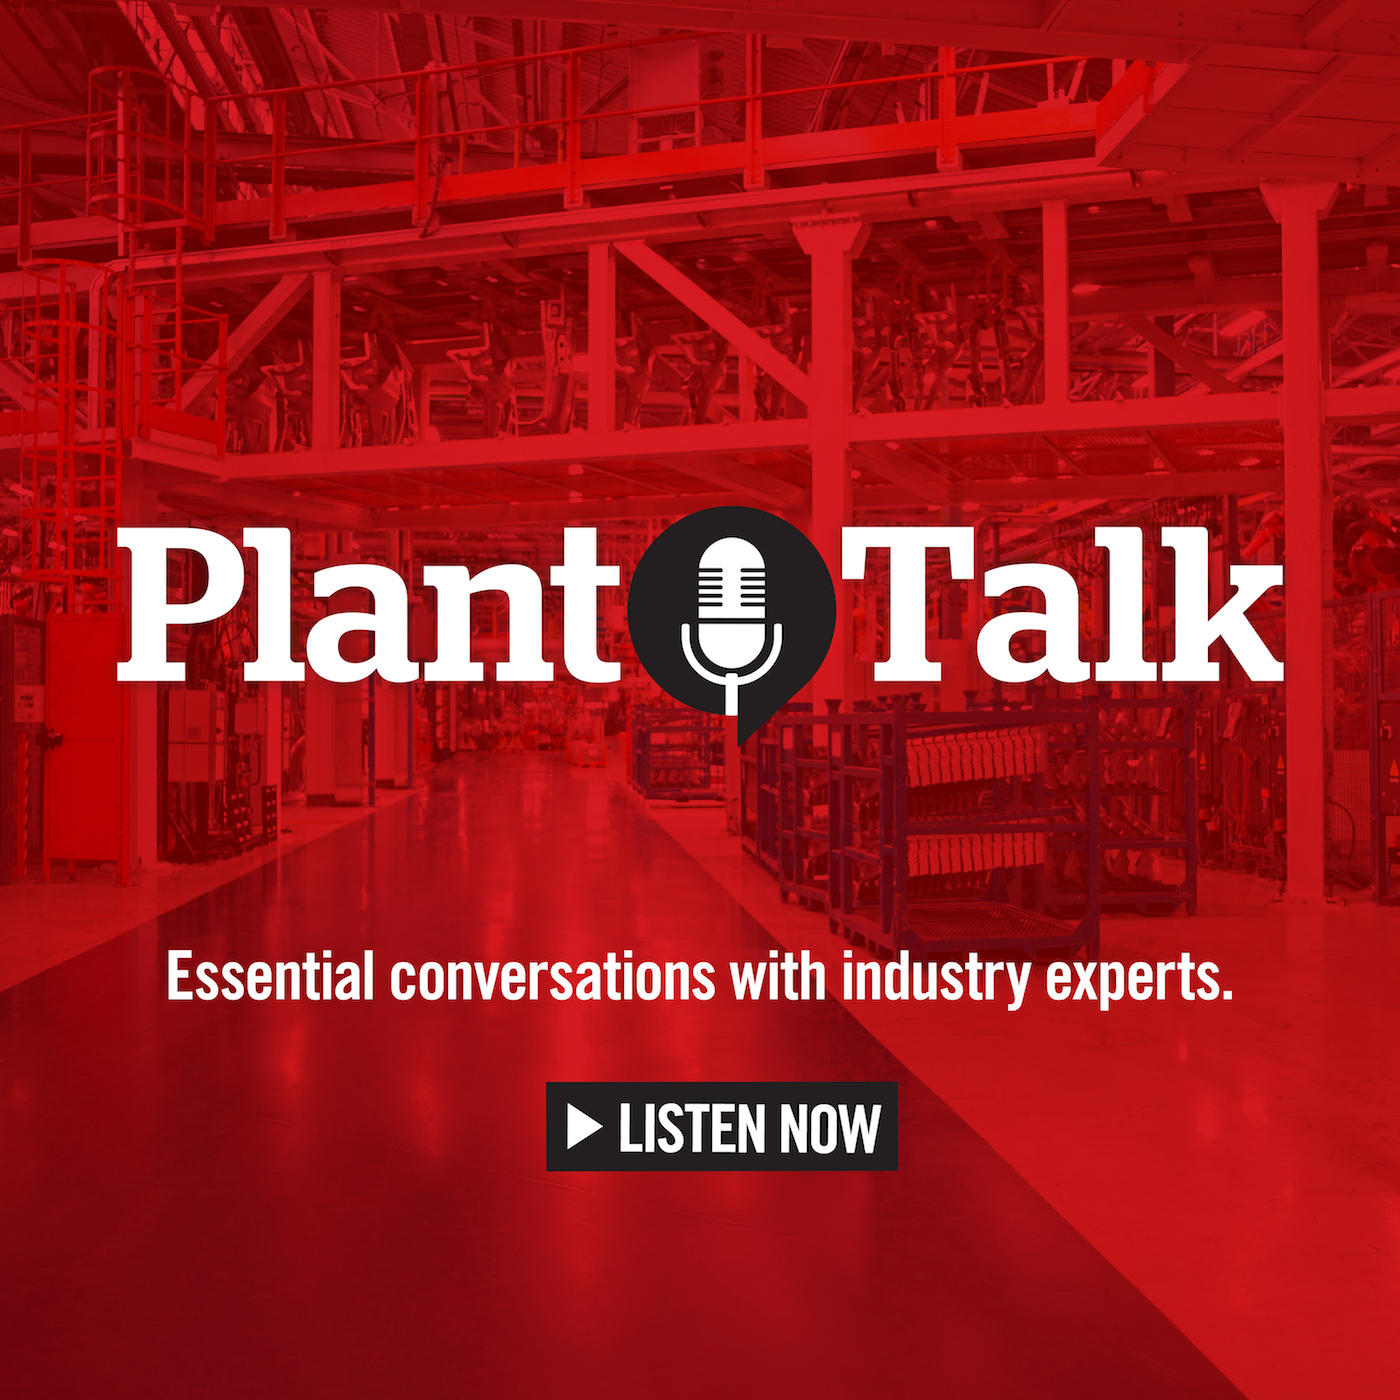 Artwork for podcast Plant Talk